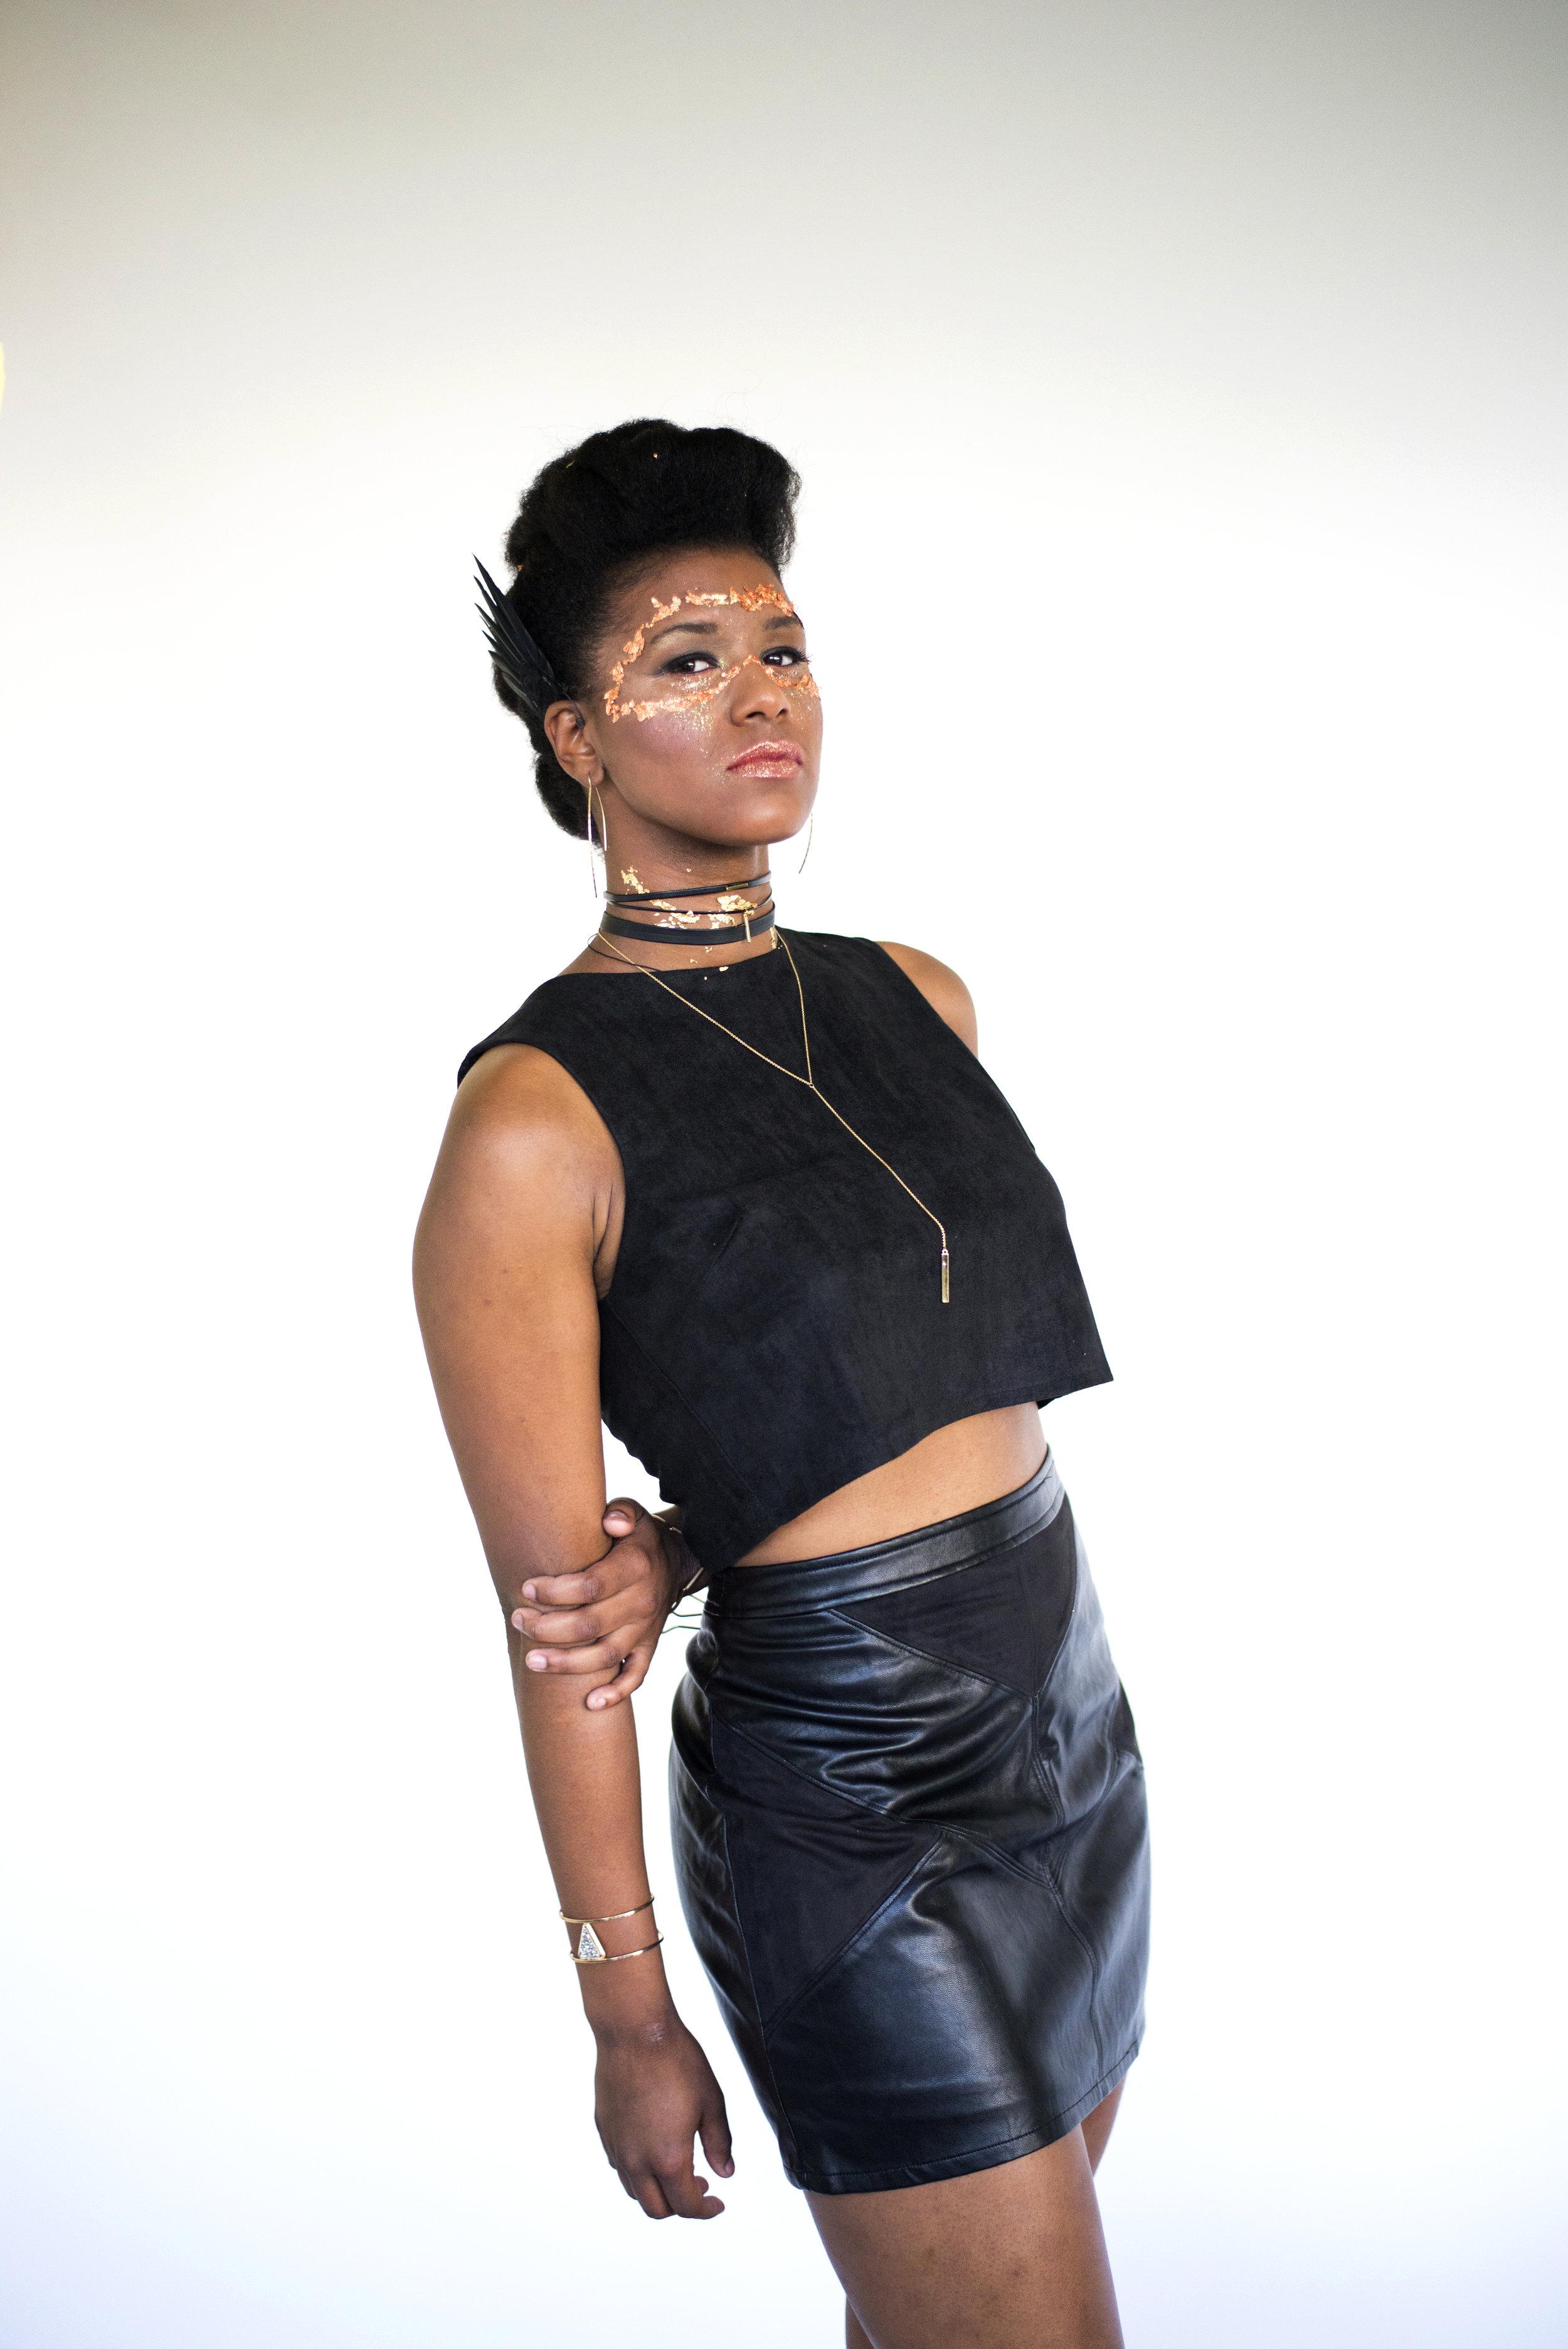 Makeup+Black Clothes_Allie Appel_92.jpg